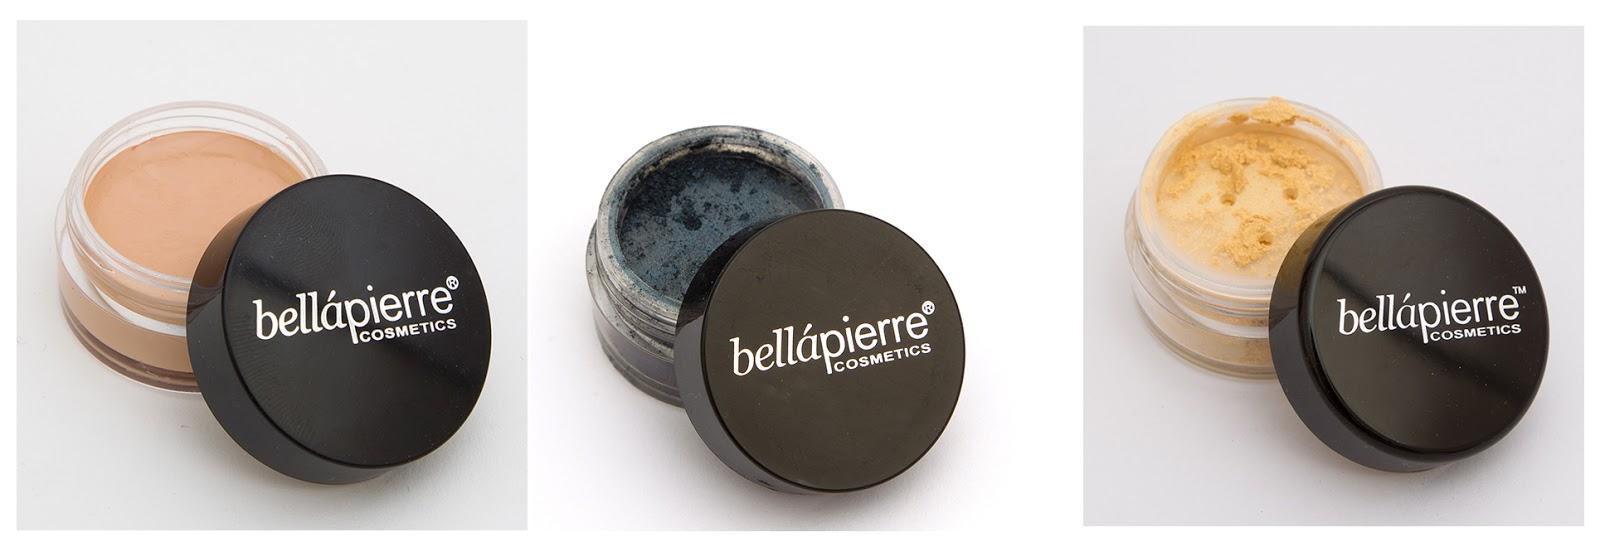 c2189e40579 Värvisin ripsmed musta tušiga, kulmud pruuni lauvärviga ja kandsin huultele  värvitut läiget.